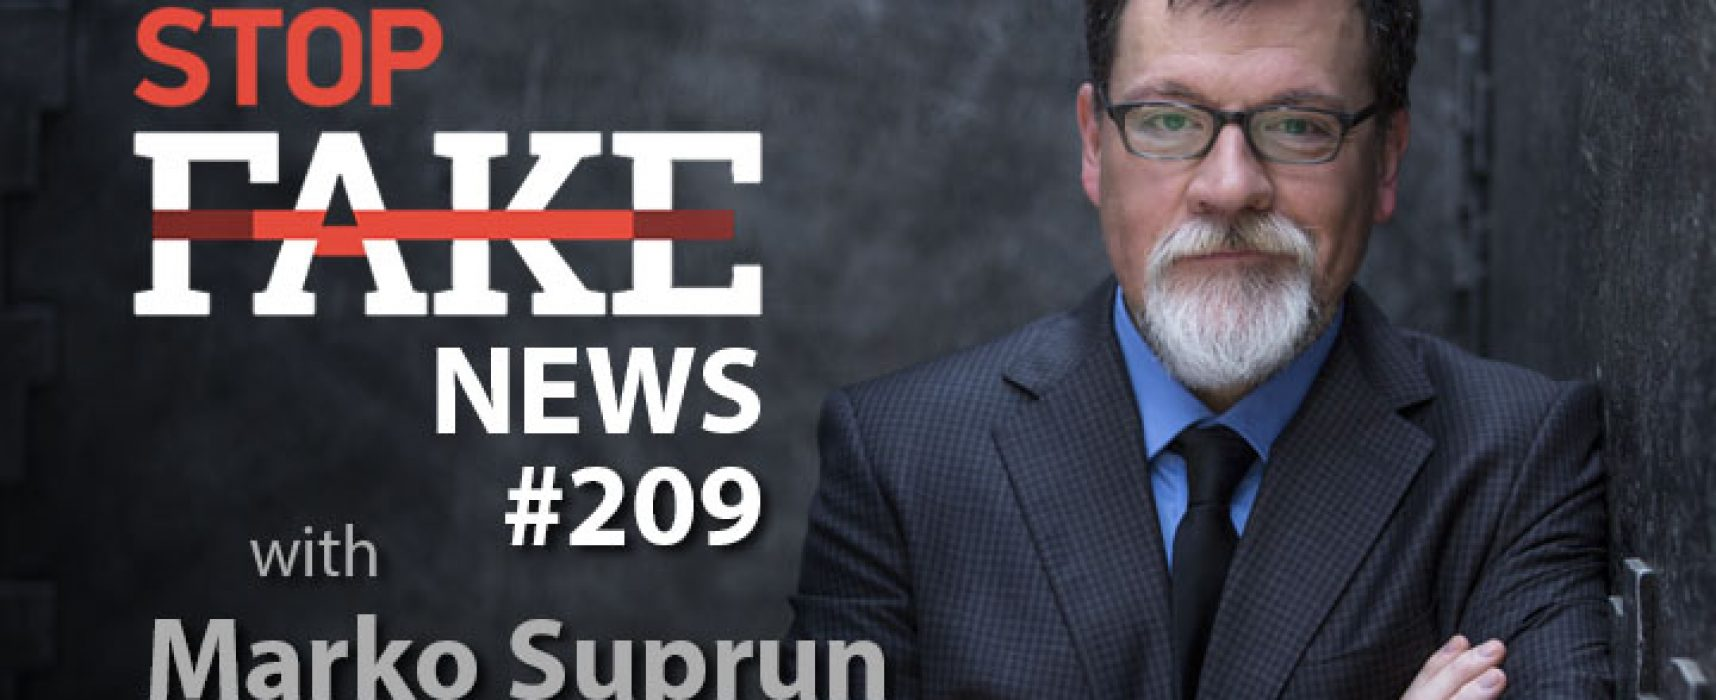 StopFake #209 with Marko Suprun